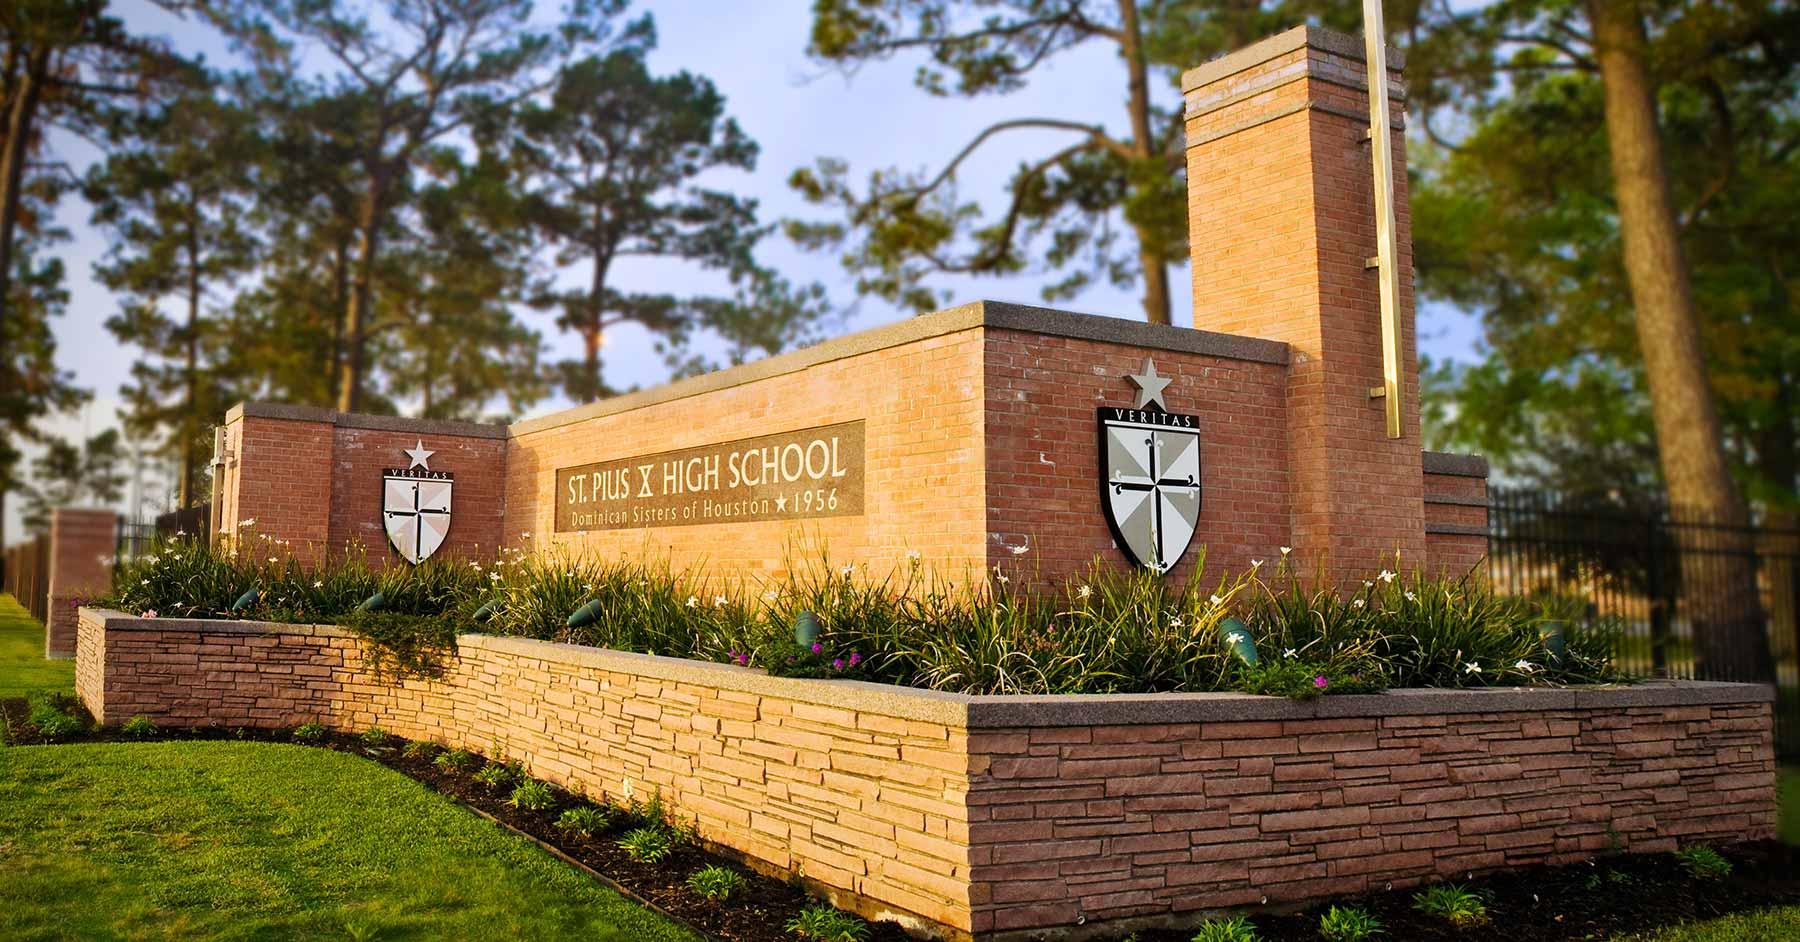 Amerigo Houston – St. Pius X High School